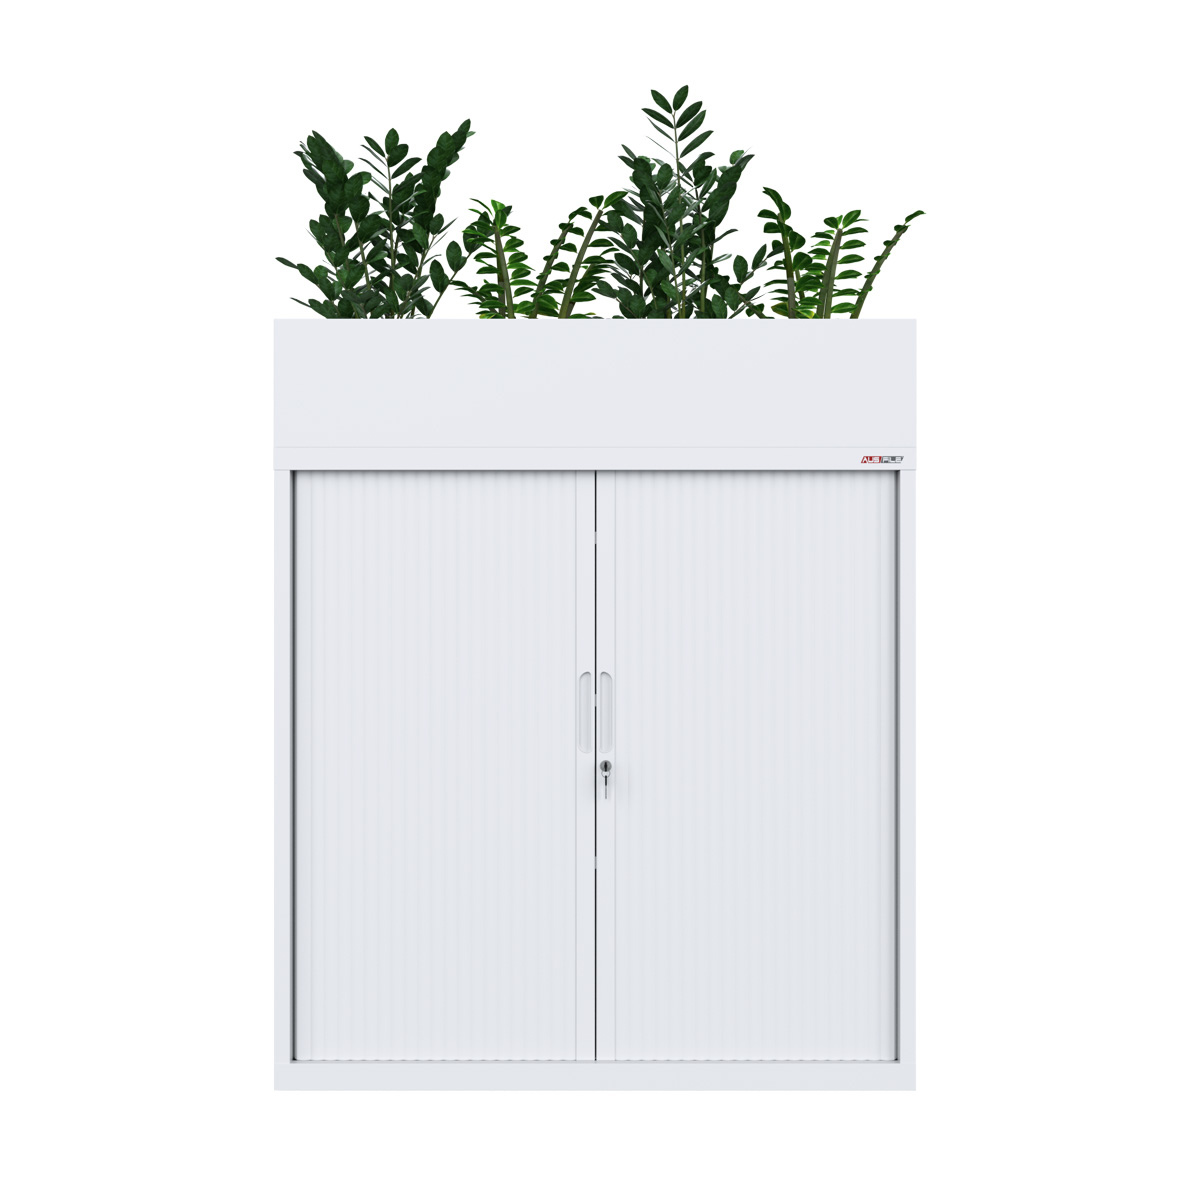 white tambour cabinet with planter box